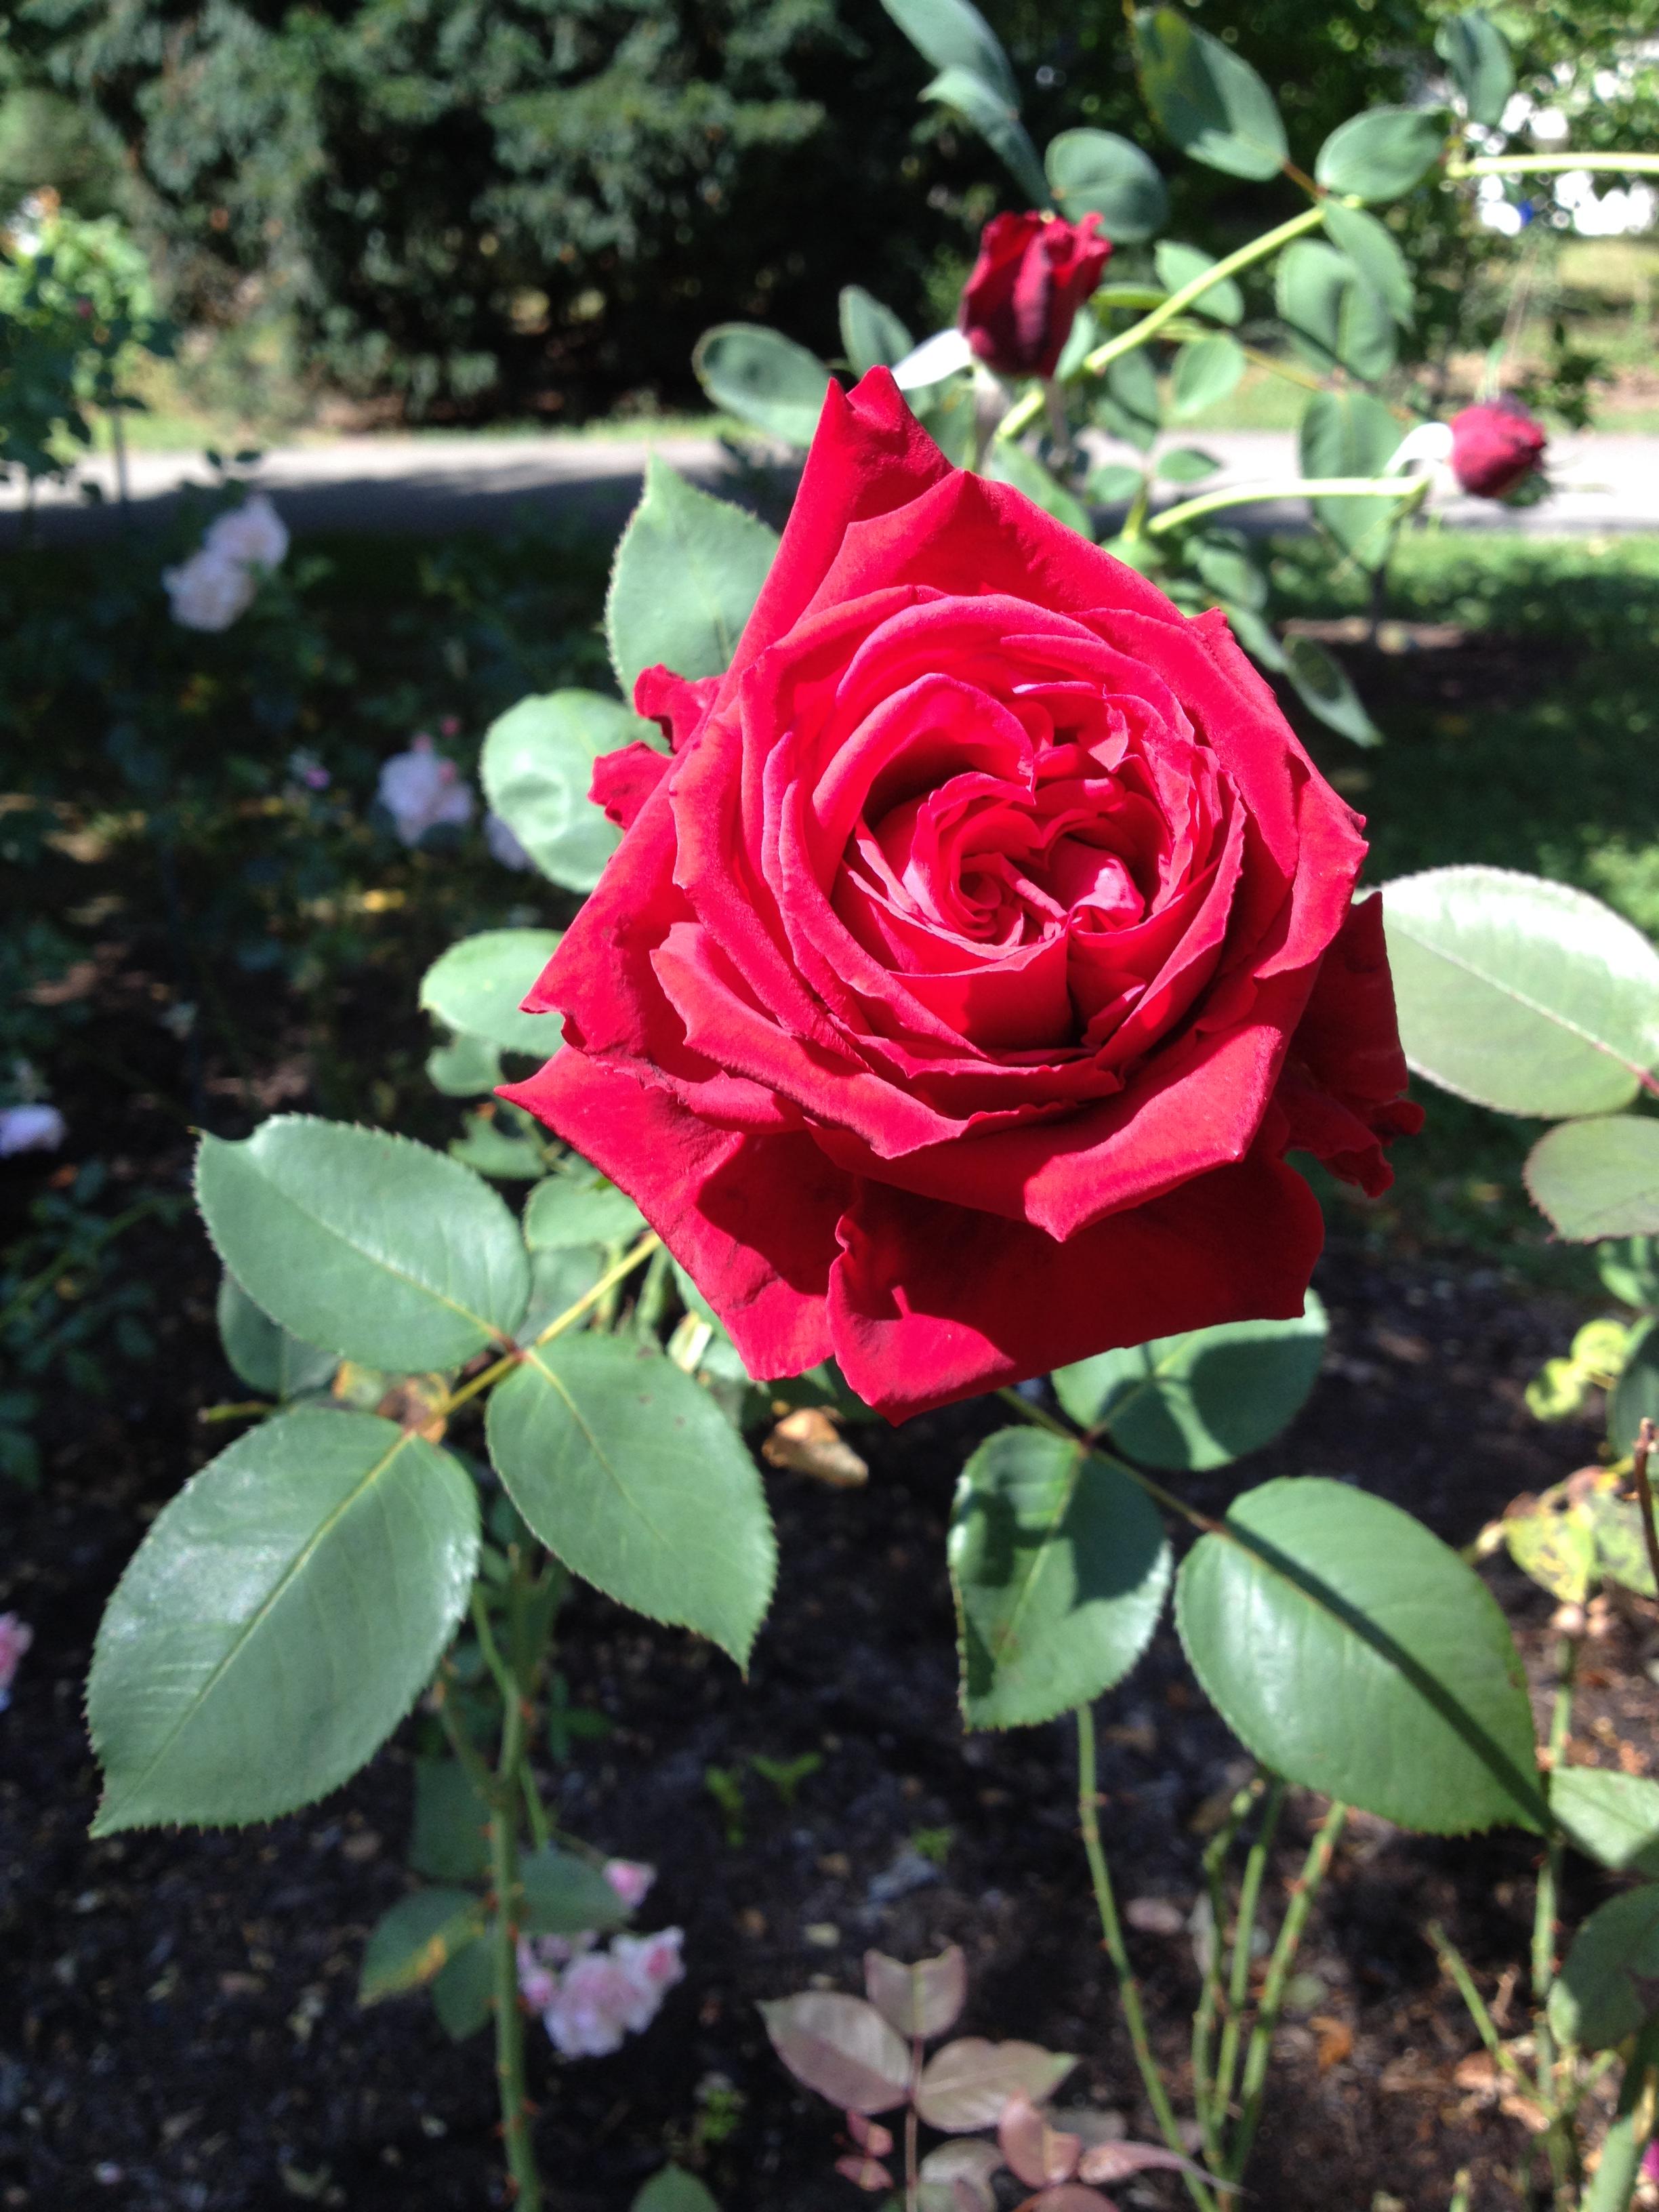 Roses In Garden: Essex County Brookdale Park Rose Garden